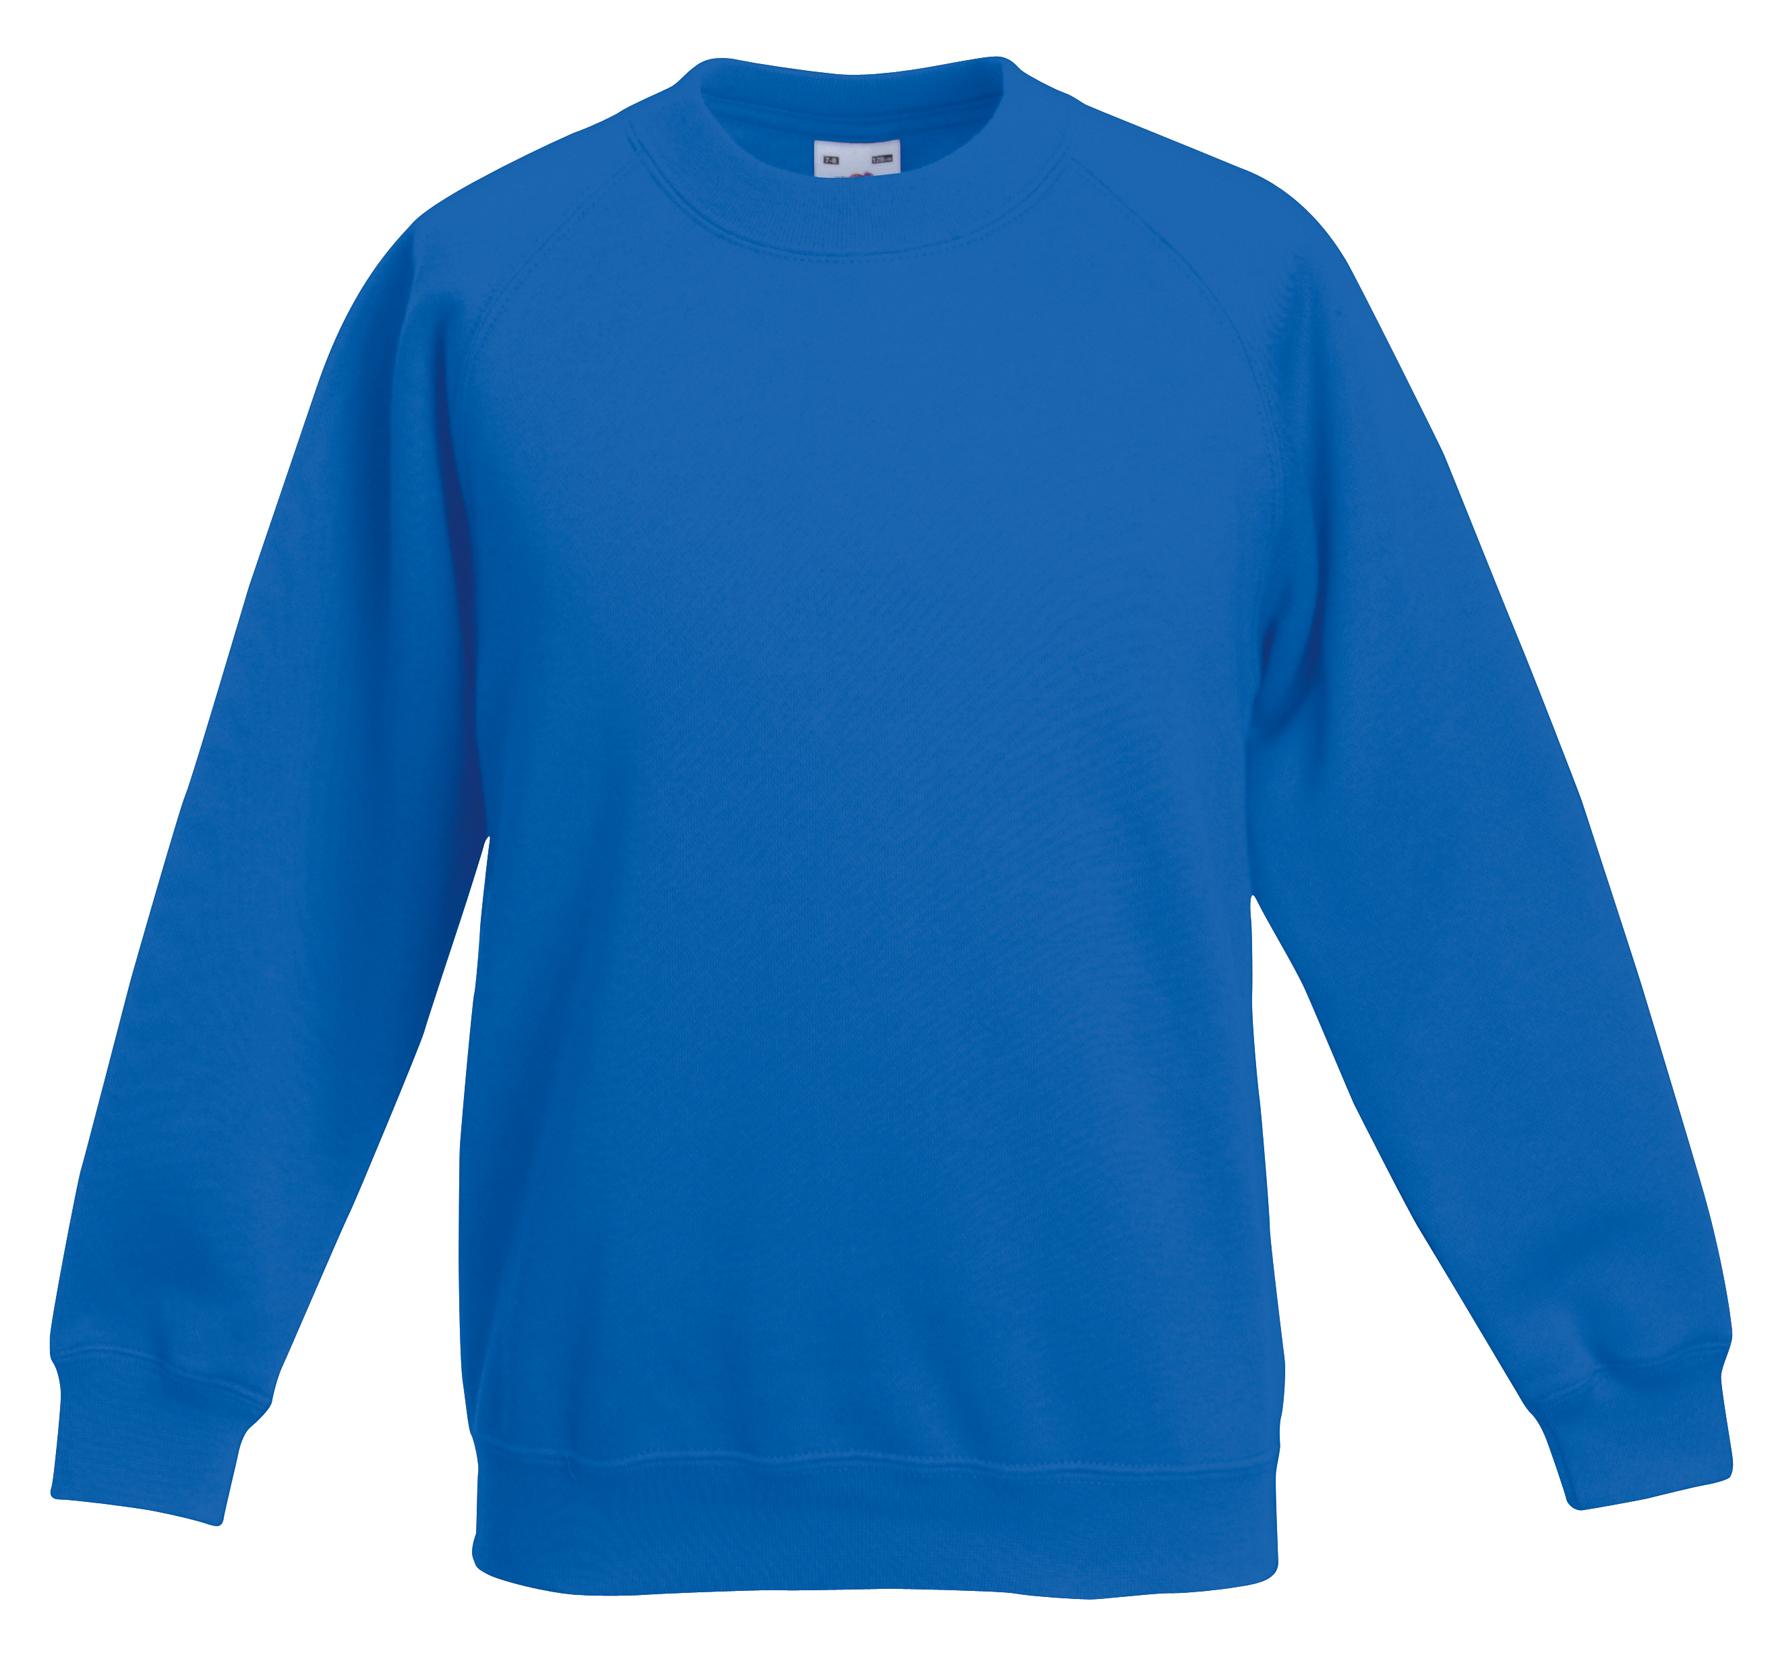 FotL 620390 Royal Blue